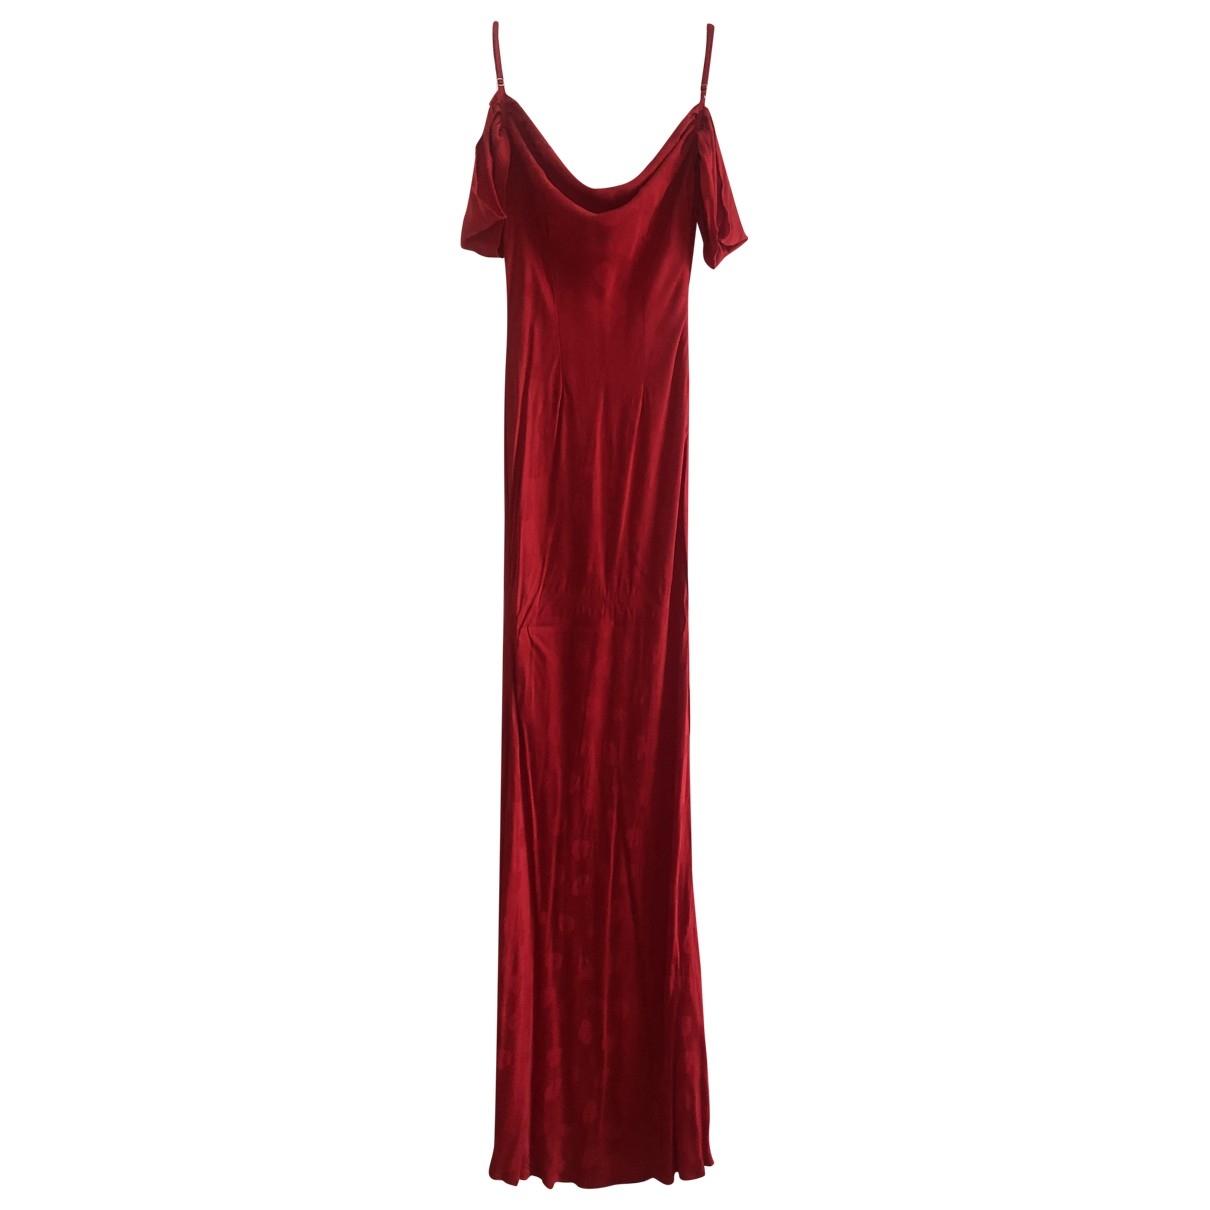 Rat & Boa \N Kleid in  Rot Polyester